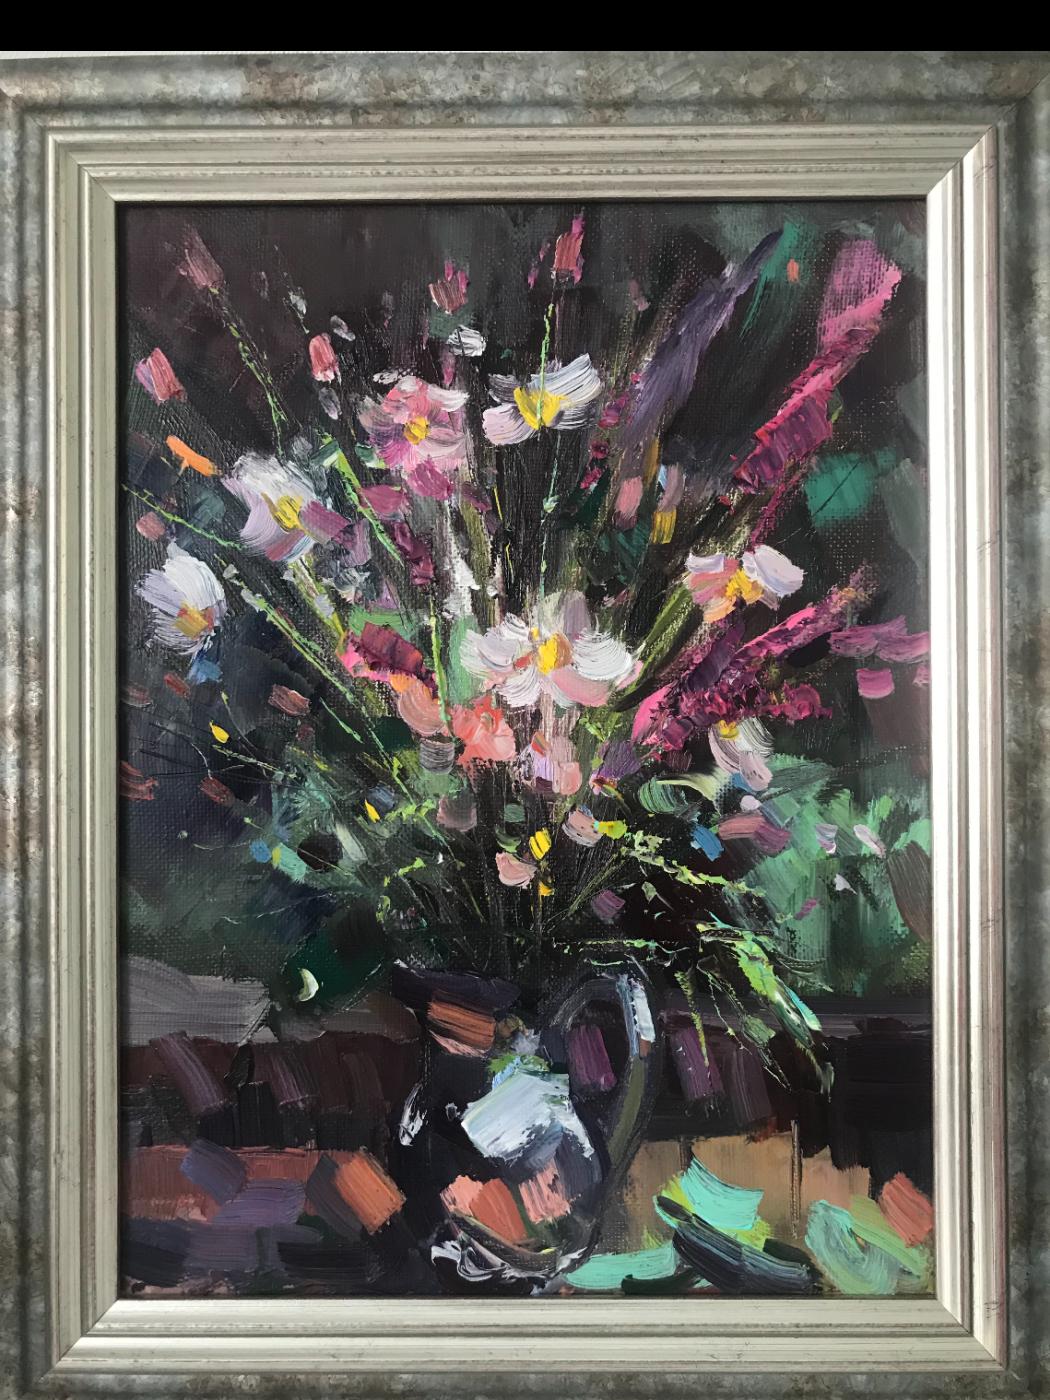 Екатерина Александровна Сильченко. Bouquet of flowers in a jug